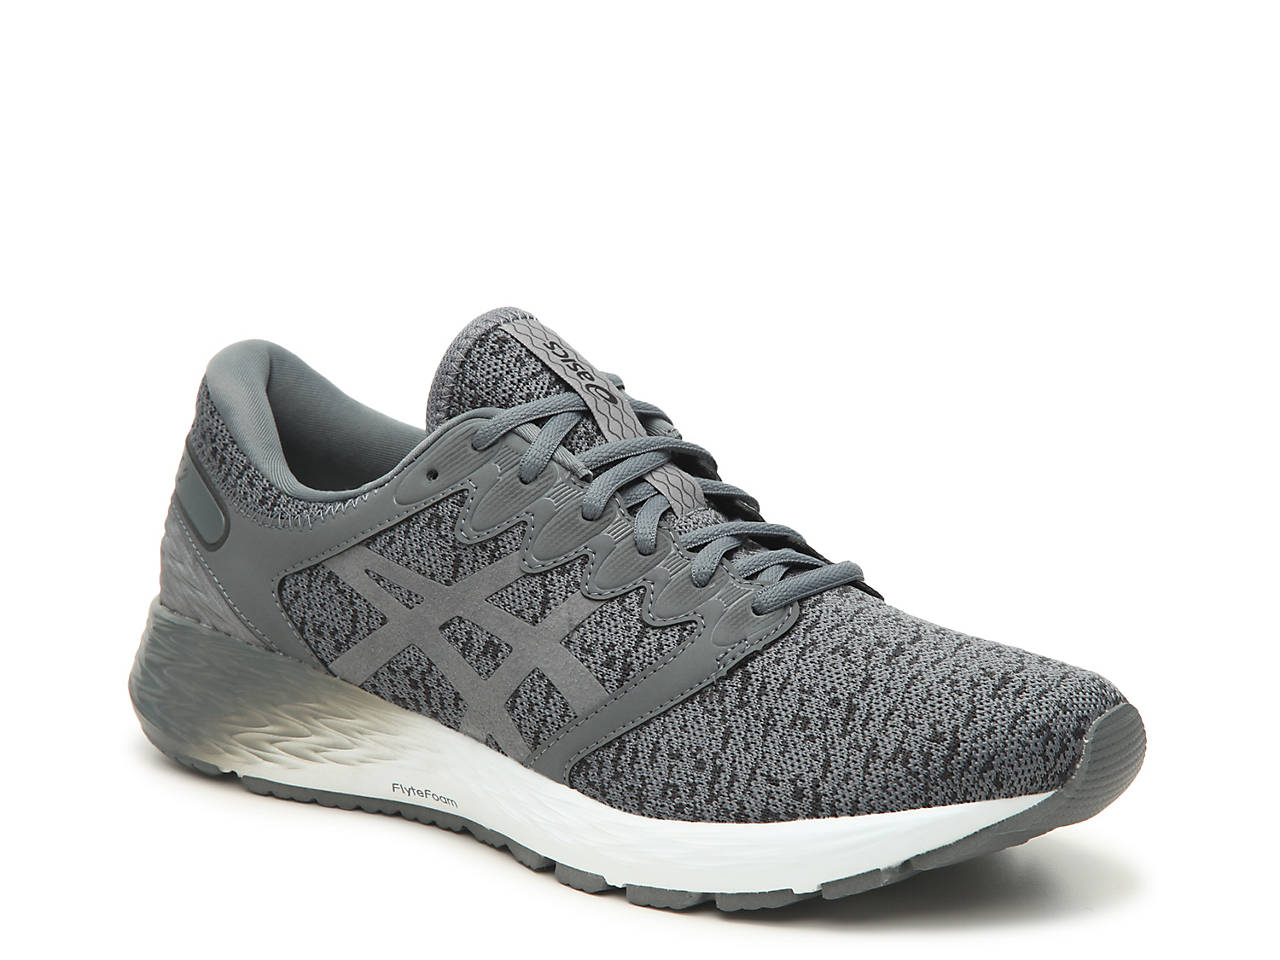 b5ecab3757ba ASICS Roadhawk FF 2 Running Shoe - Men s Men s Shoes